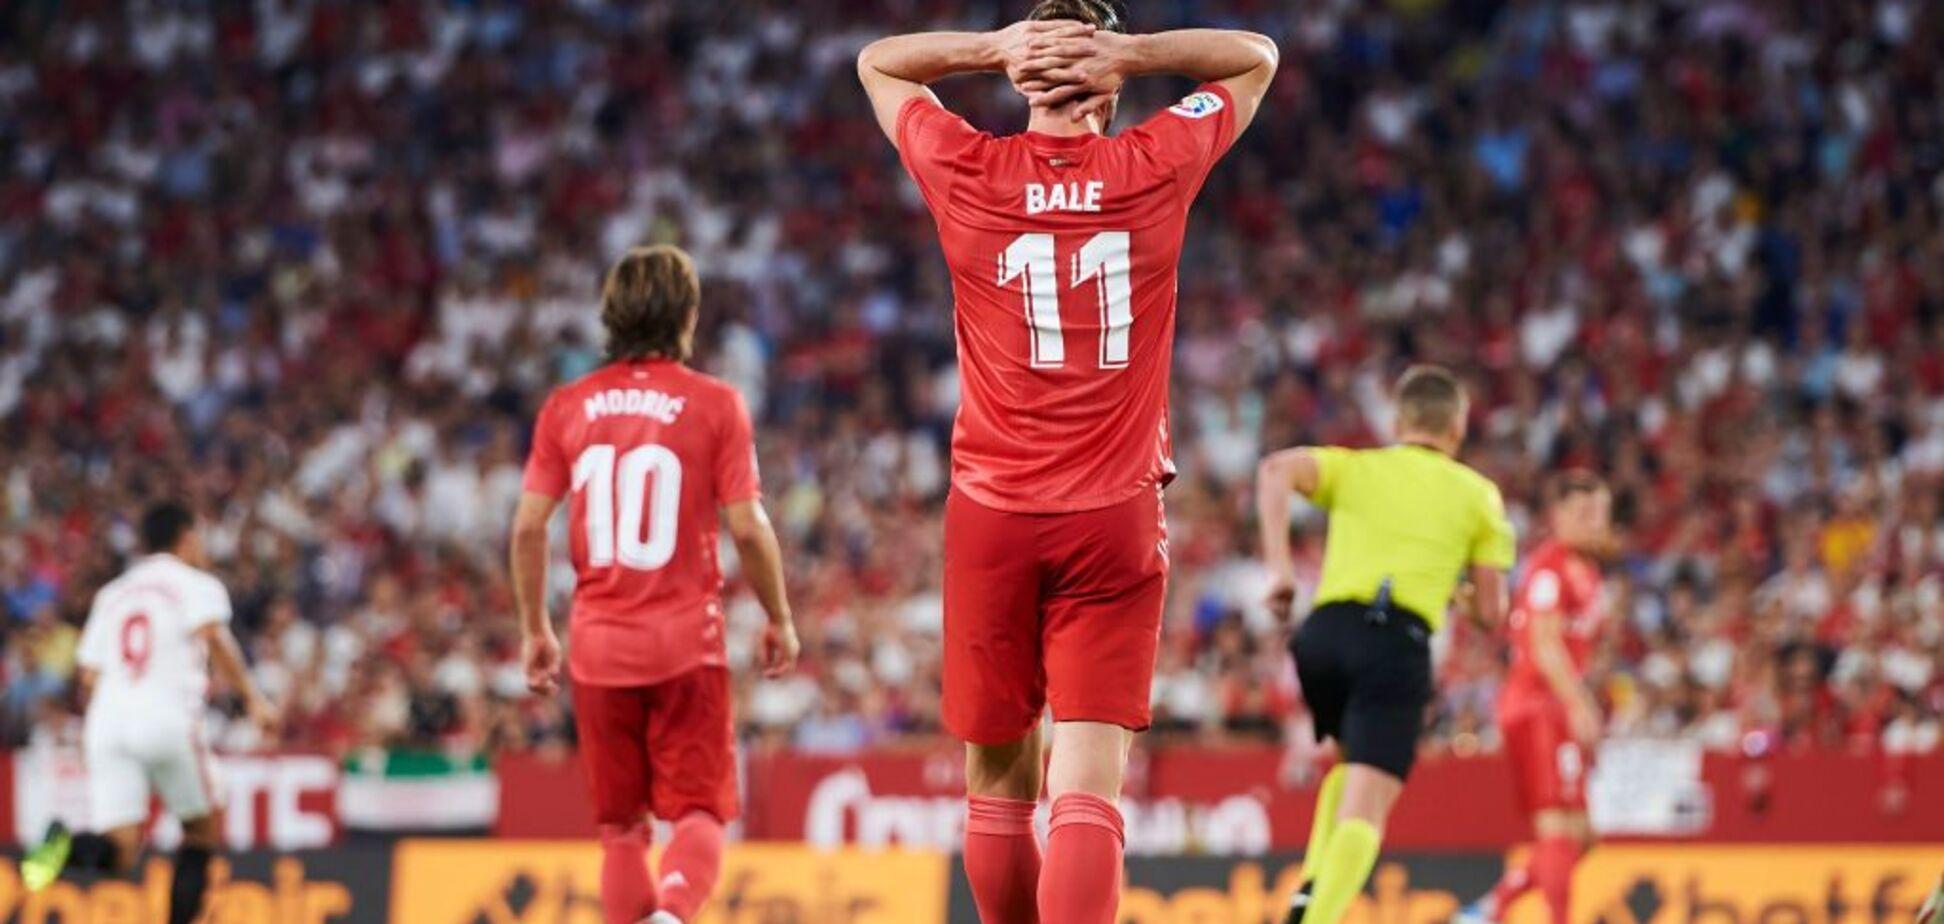 'Реал' с треском проиграл в чемпионате Испании: видеообзор